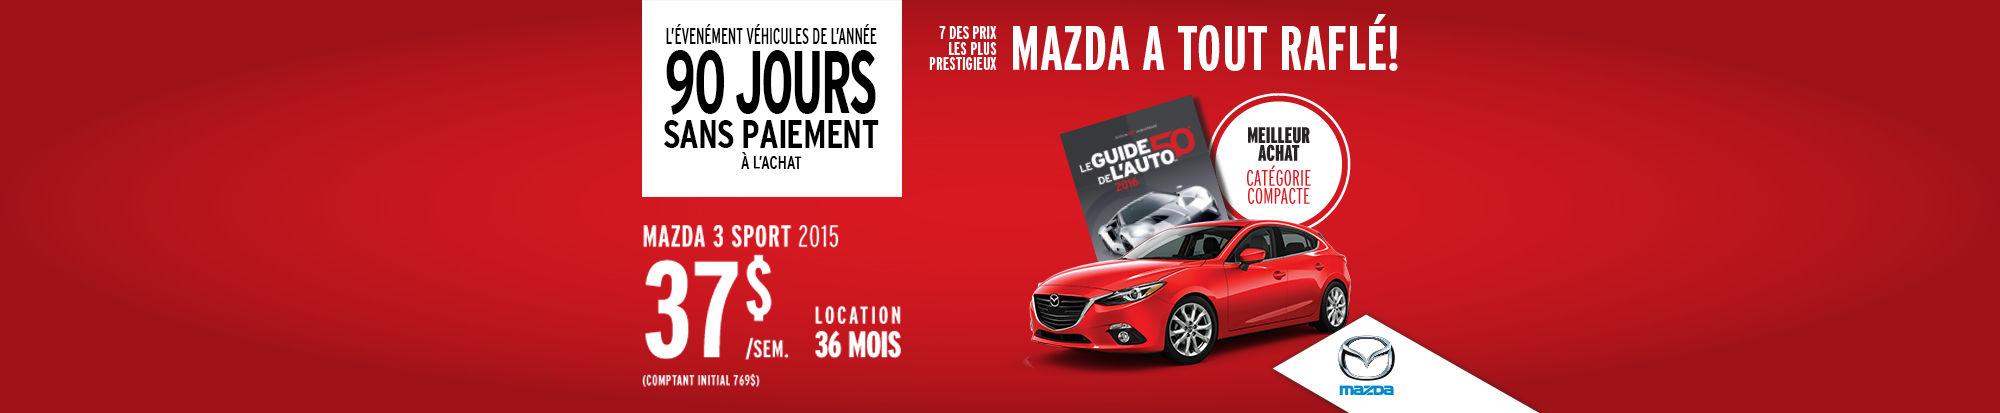 Véhicules de l'année Mazda3 sport